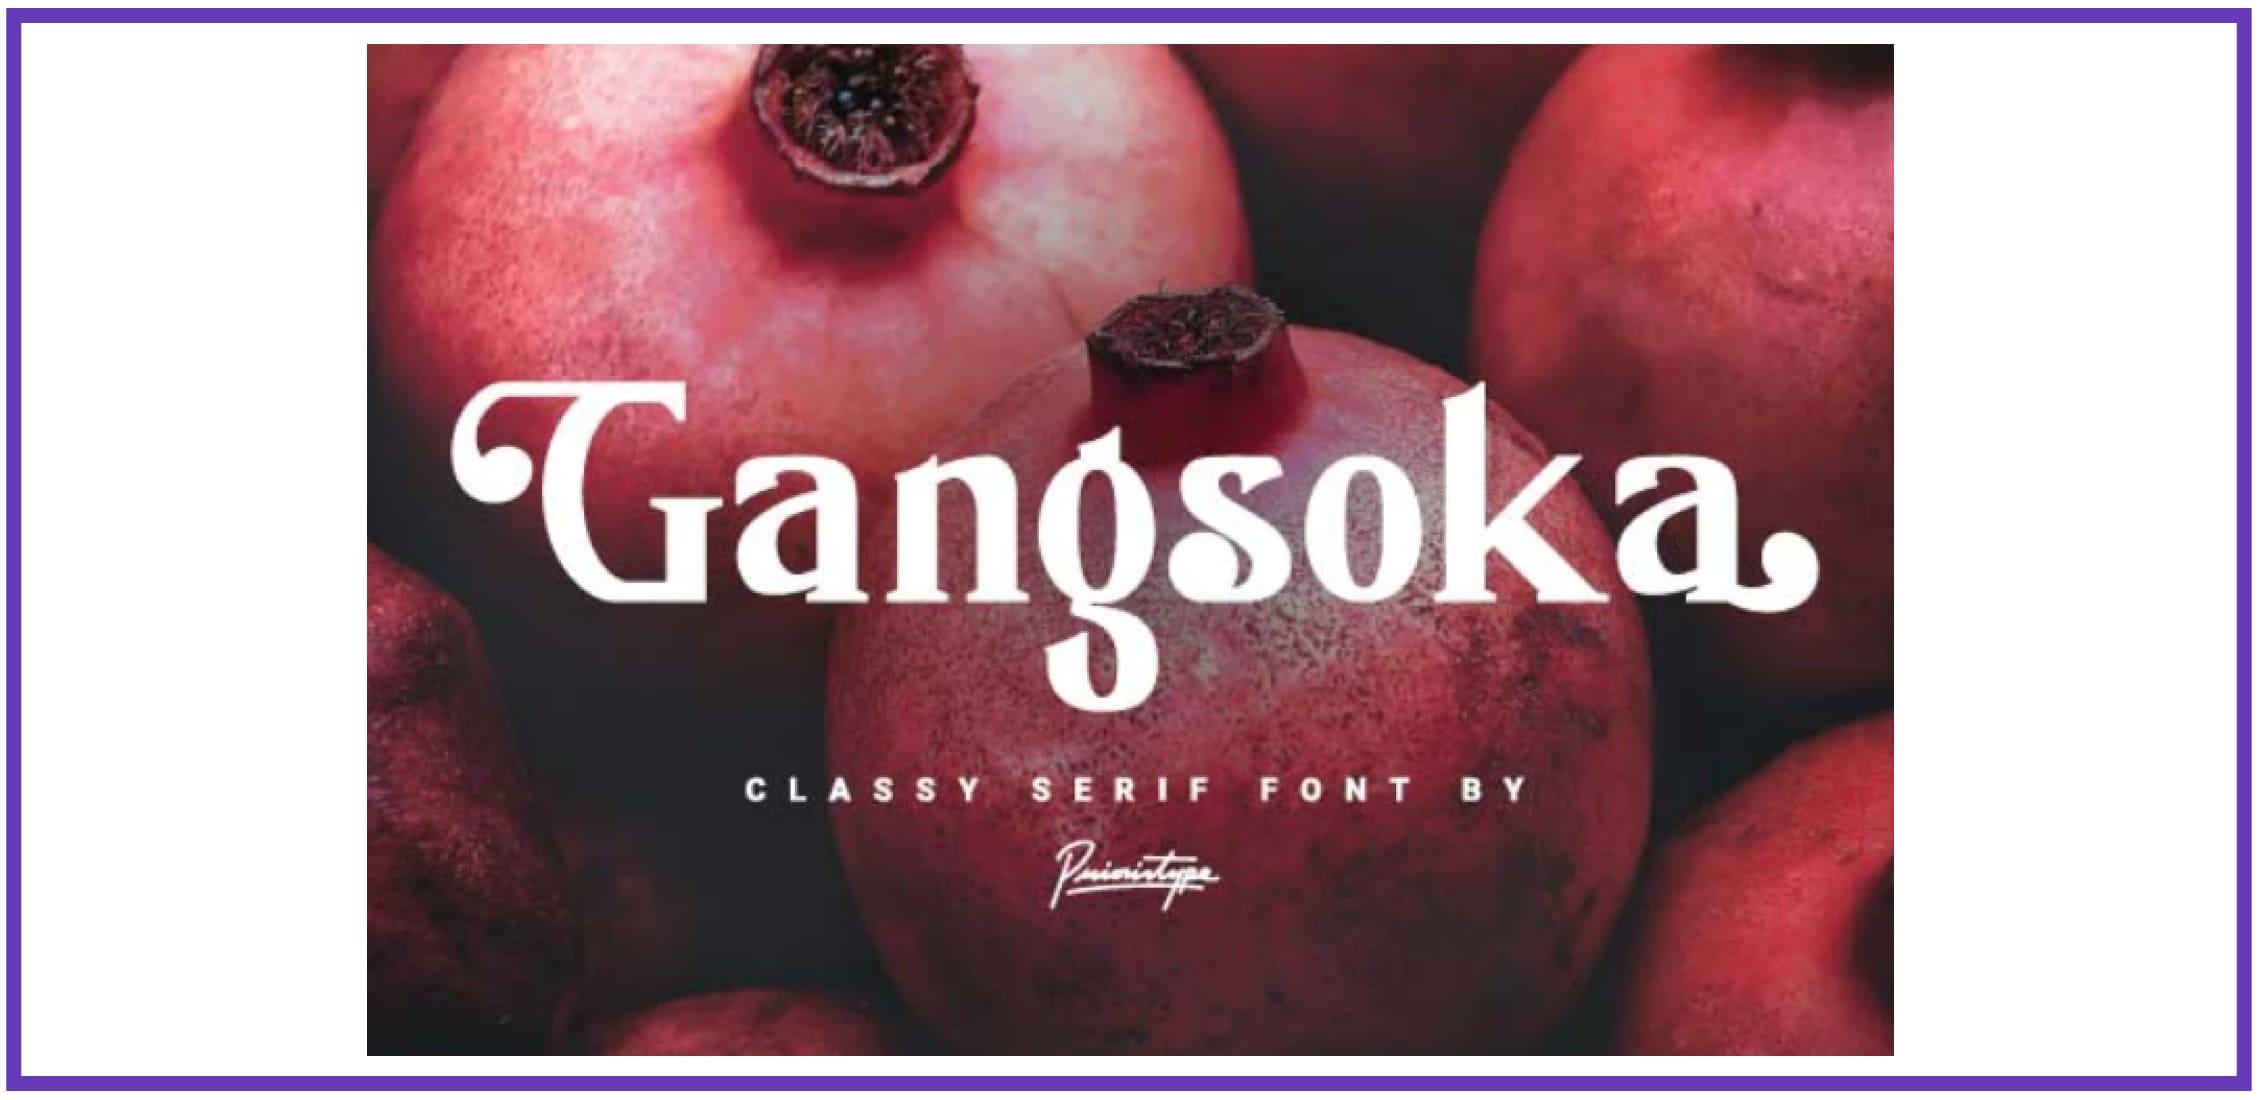 Gangsoka - Classy serif font. Best Industrial Fonts.